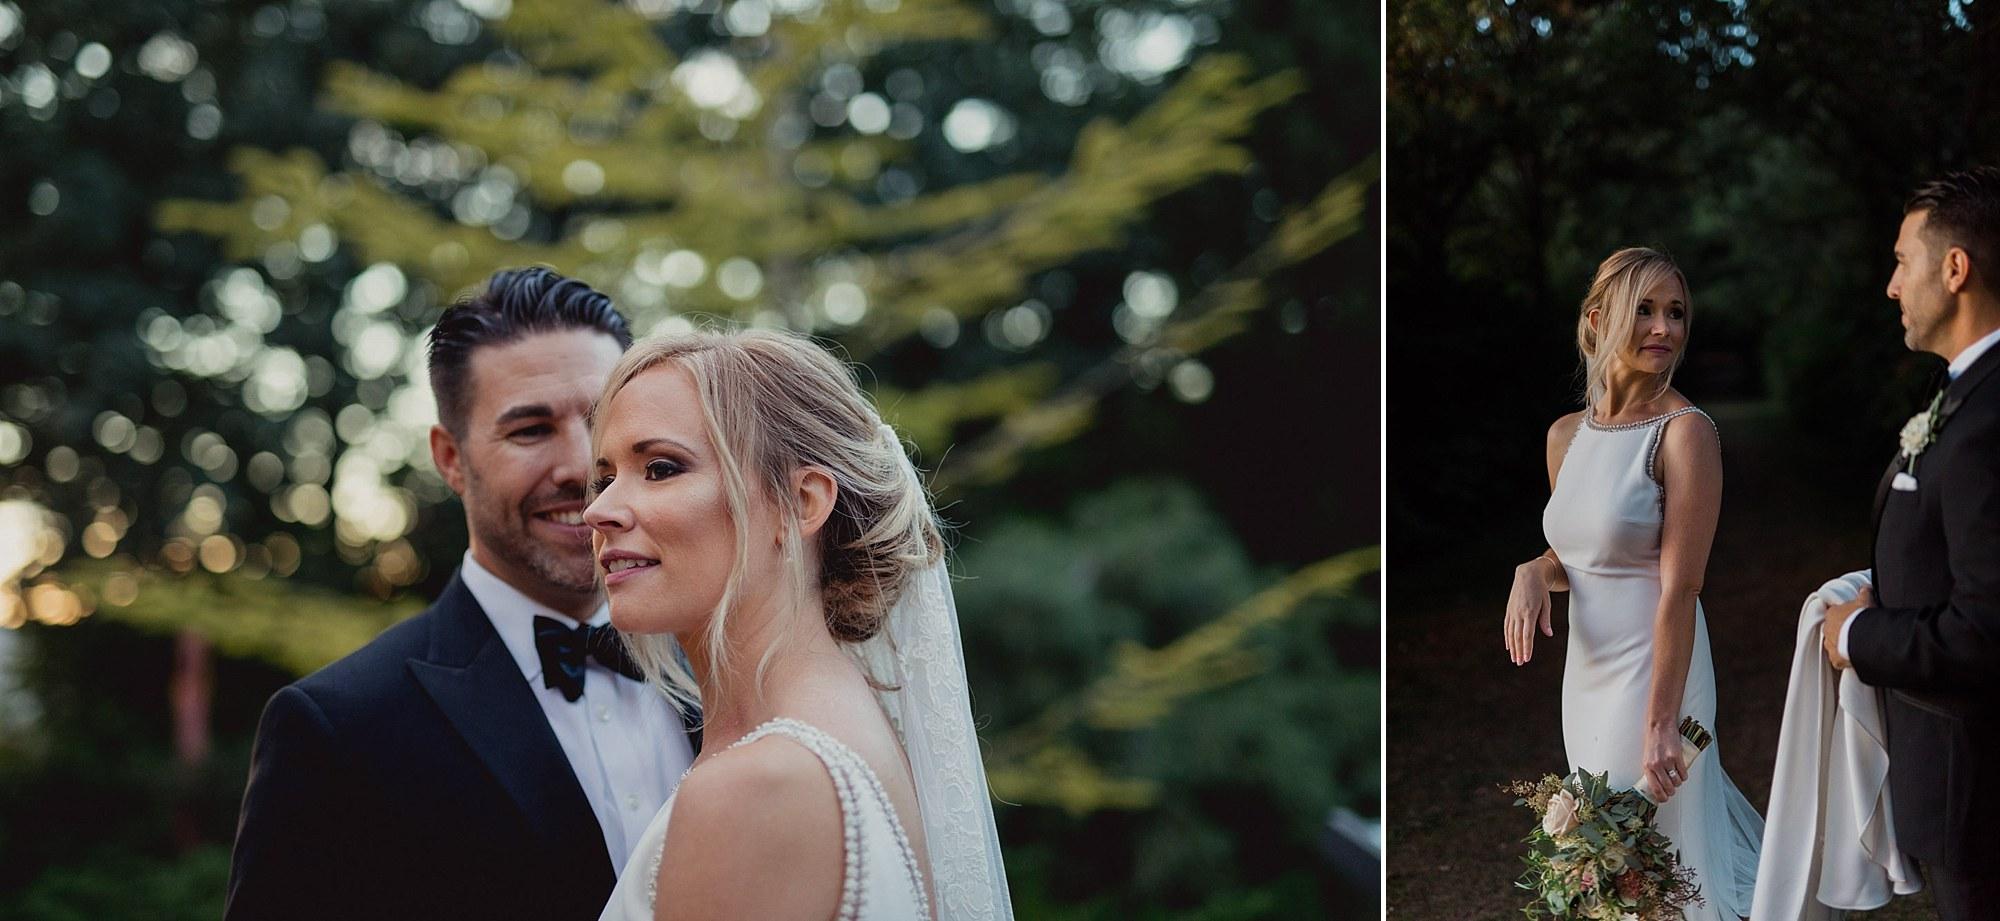 tower hill botanic garden Wedding-80.jpg